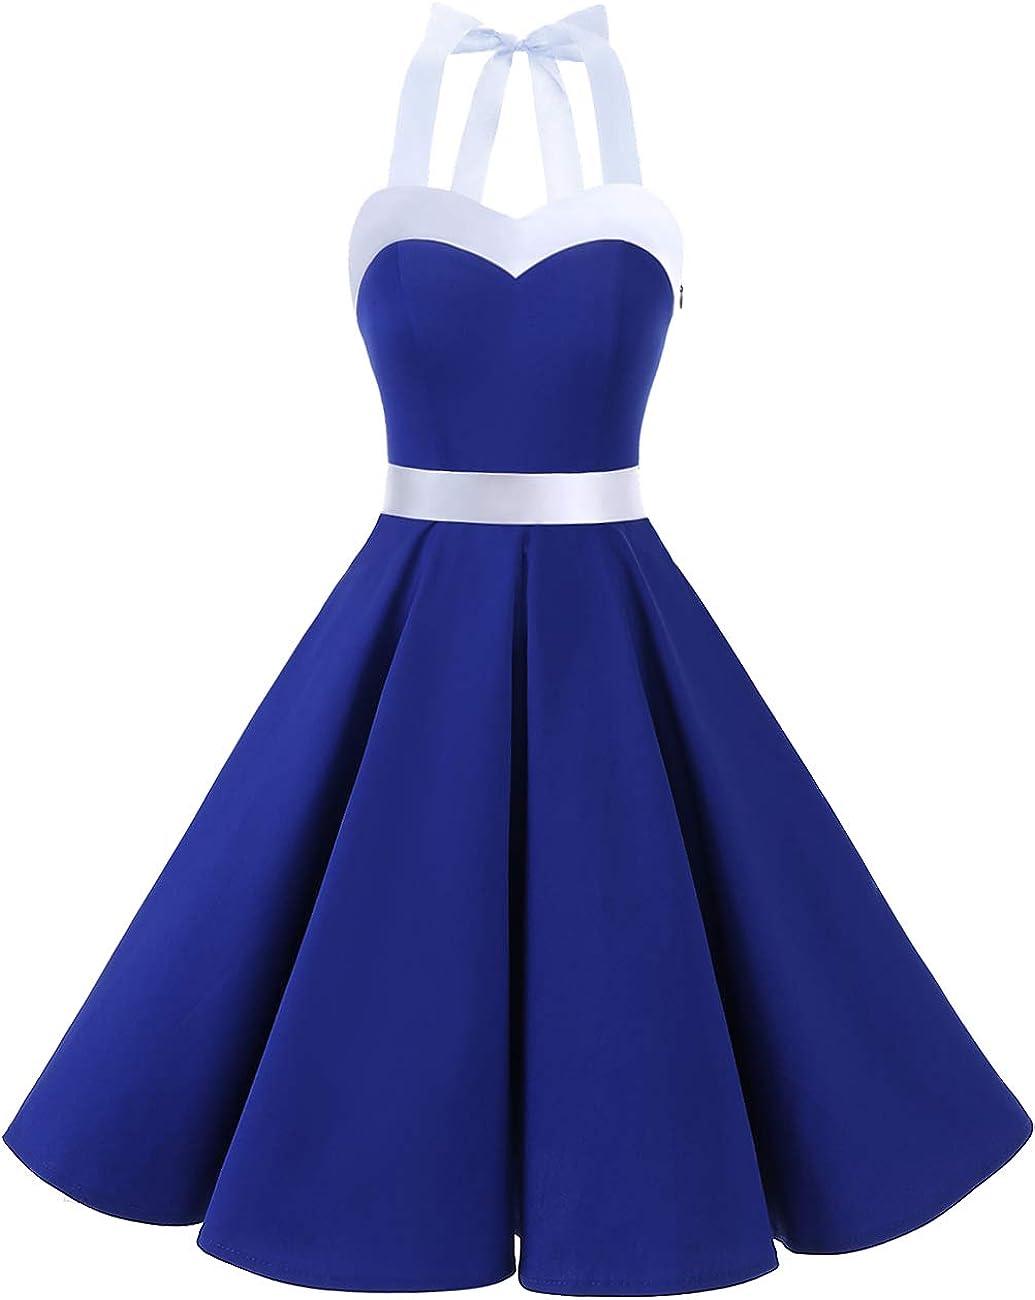 Sailor Dresses, Nautical Theme Dress, WW2 Dresses DRESSTELLS 50s Vintage 1950s Rockabilly Polka Dots Audrey Dress Retro Cocktail Dress $26.66 AT vintagedancer.com